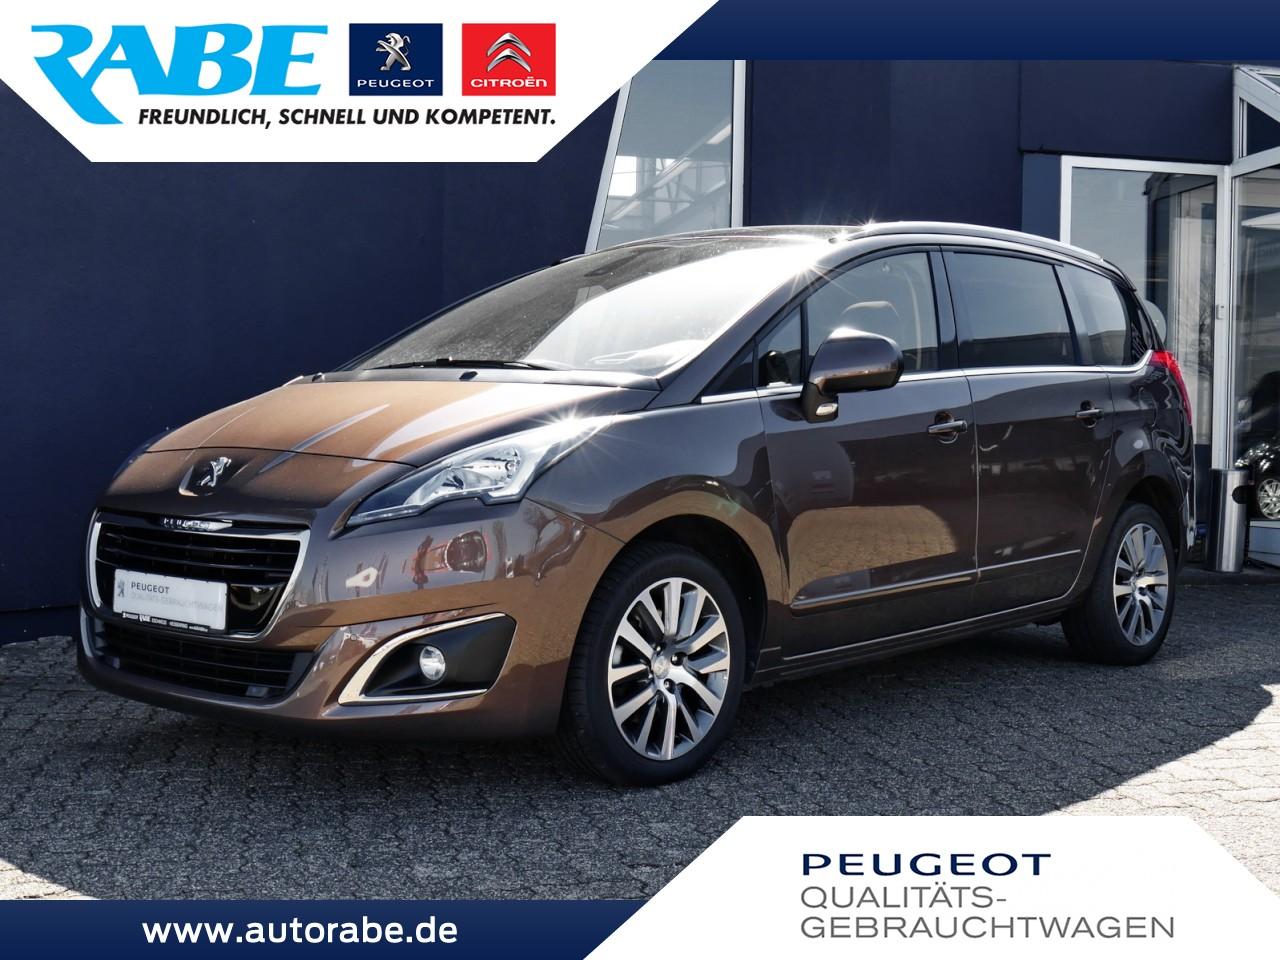 Peugeot 5008 Allure 155 THP Top-Zustand+1.Hand+Pano+PDC, Jahr 2015, Benzin